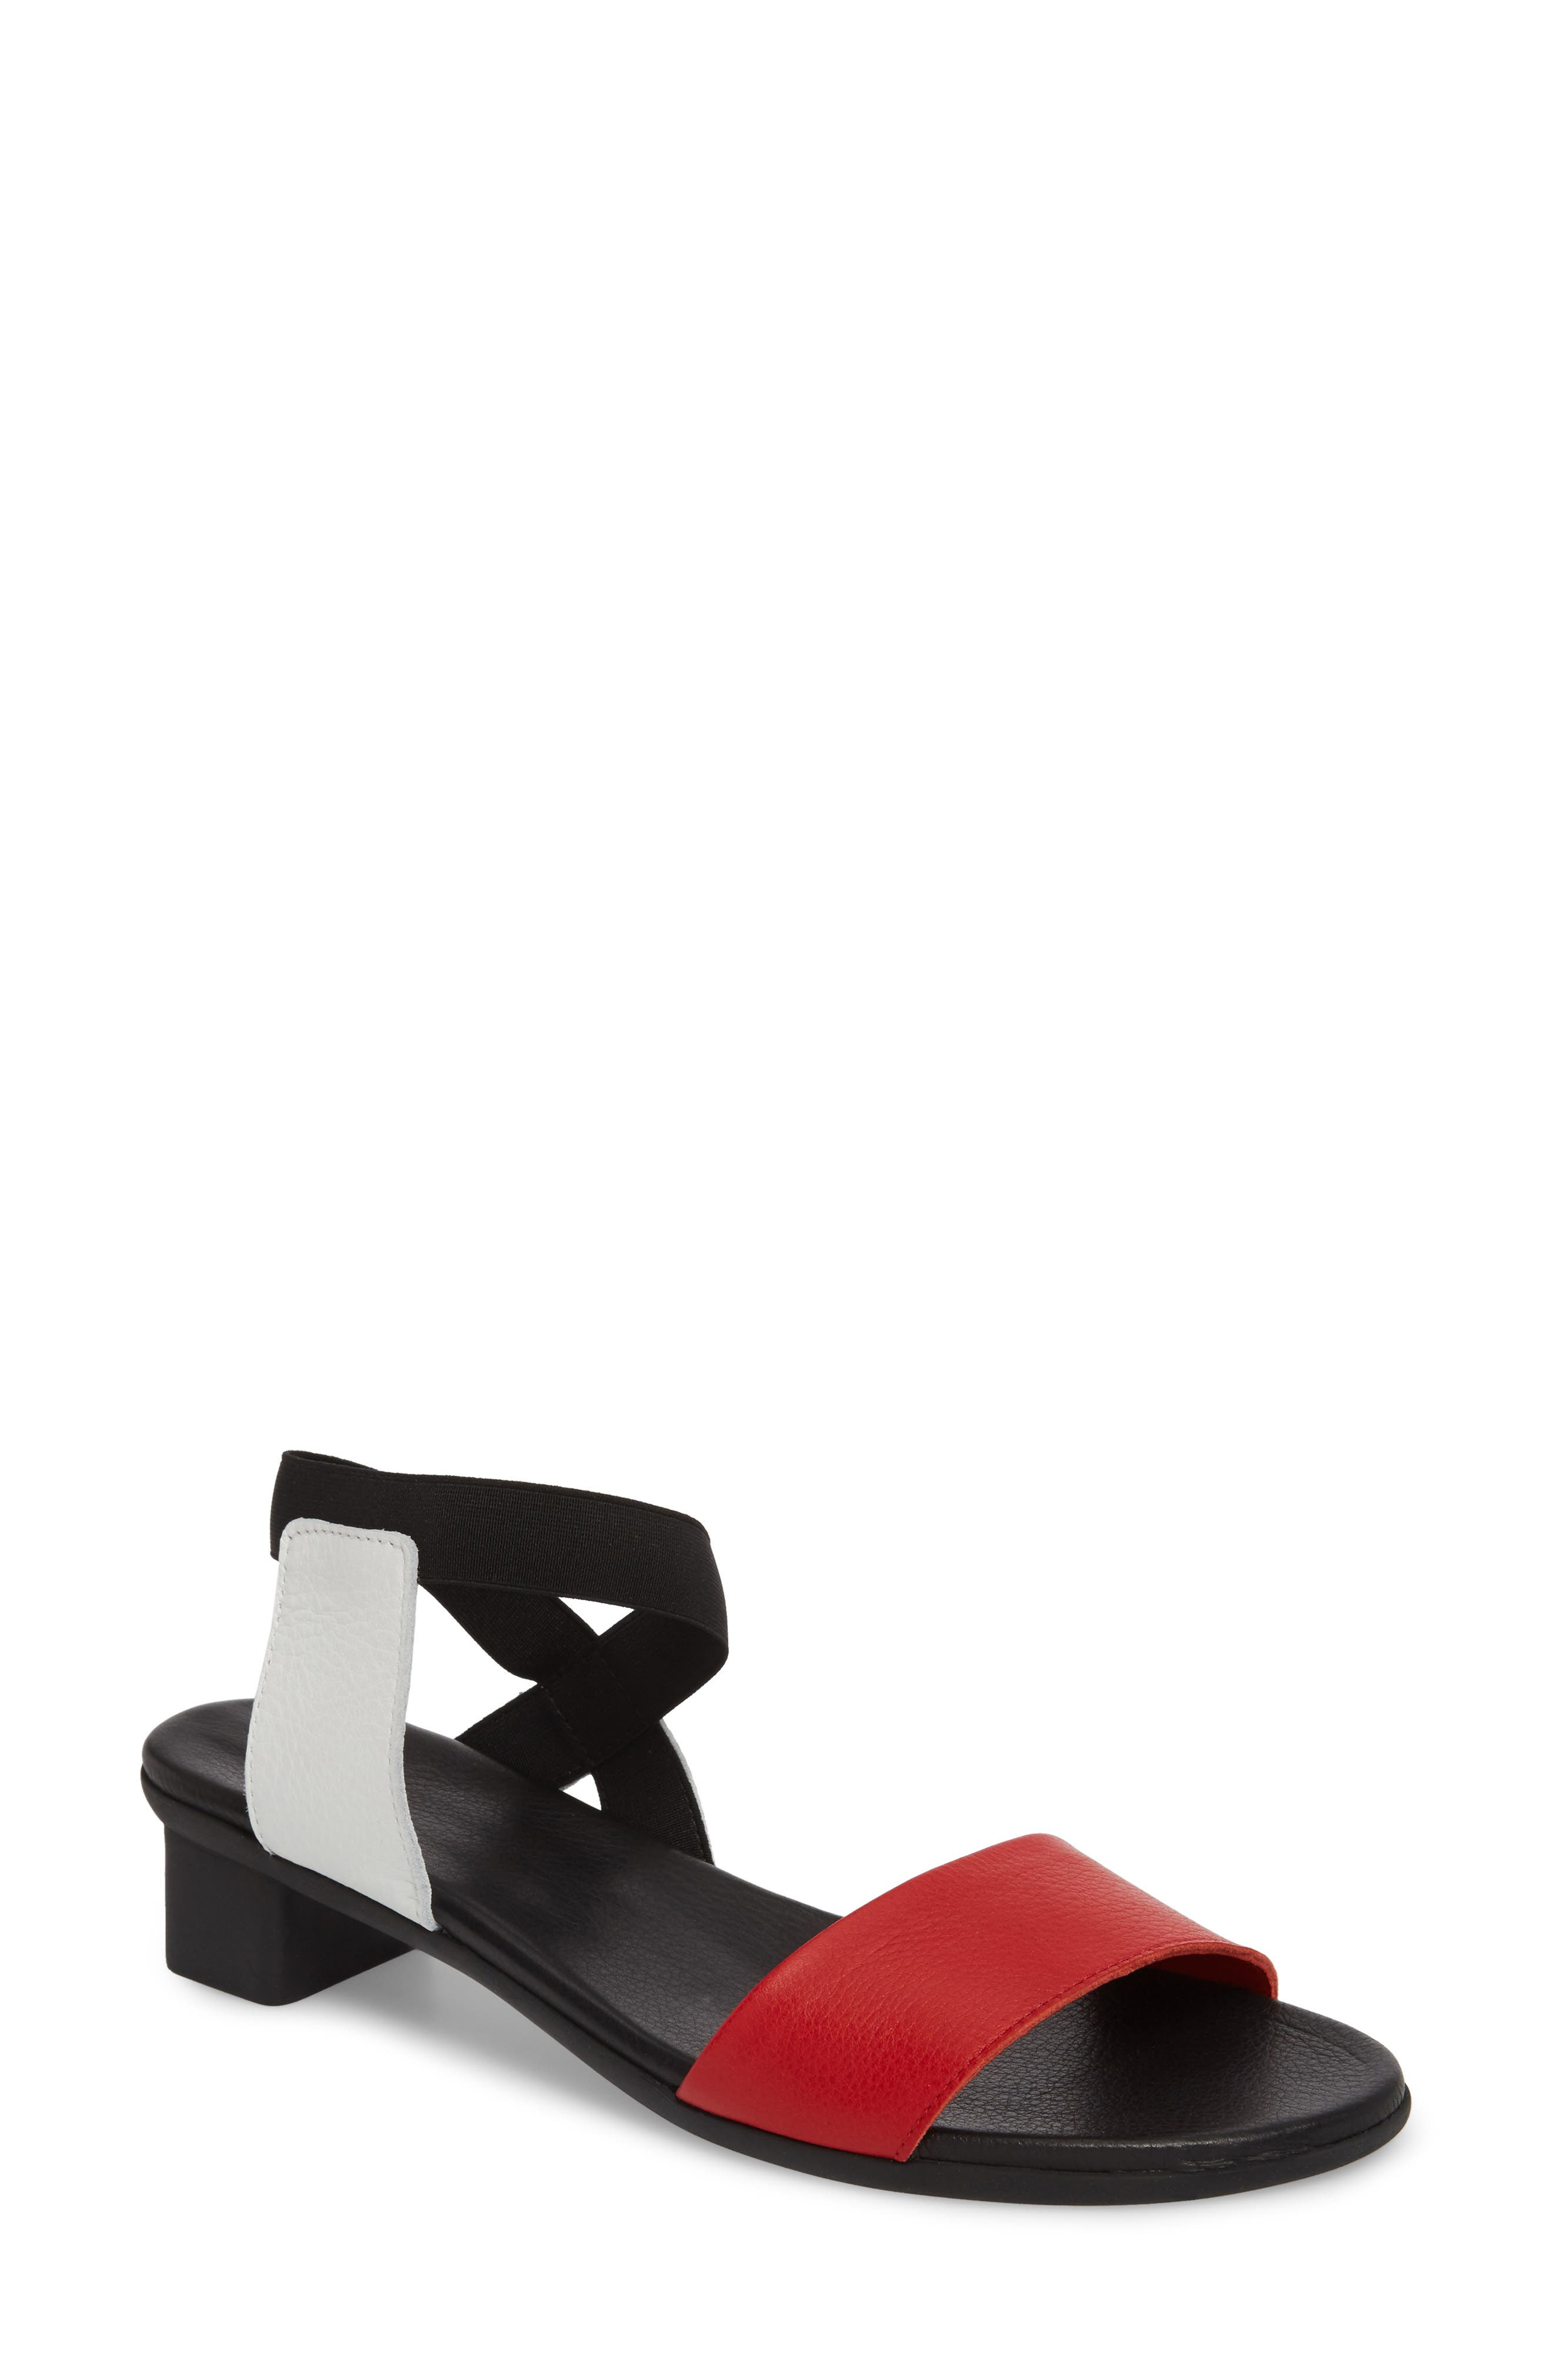 Alternate Image 1 Selected - Arche Obiaze Sandal (Women)